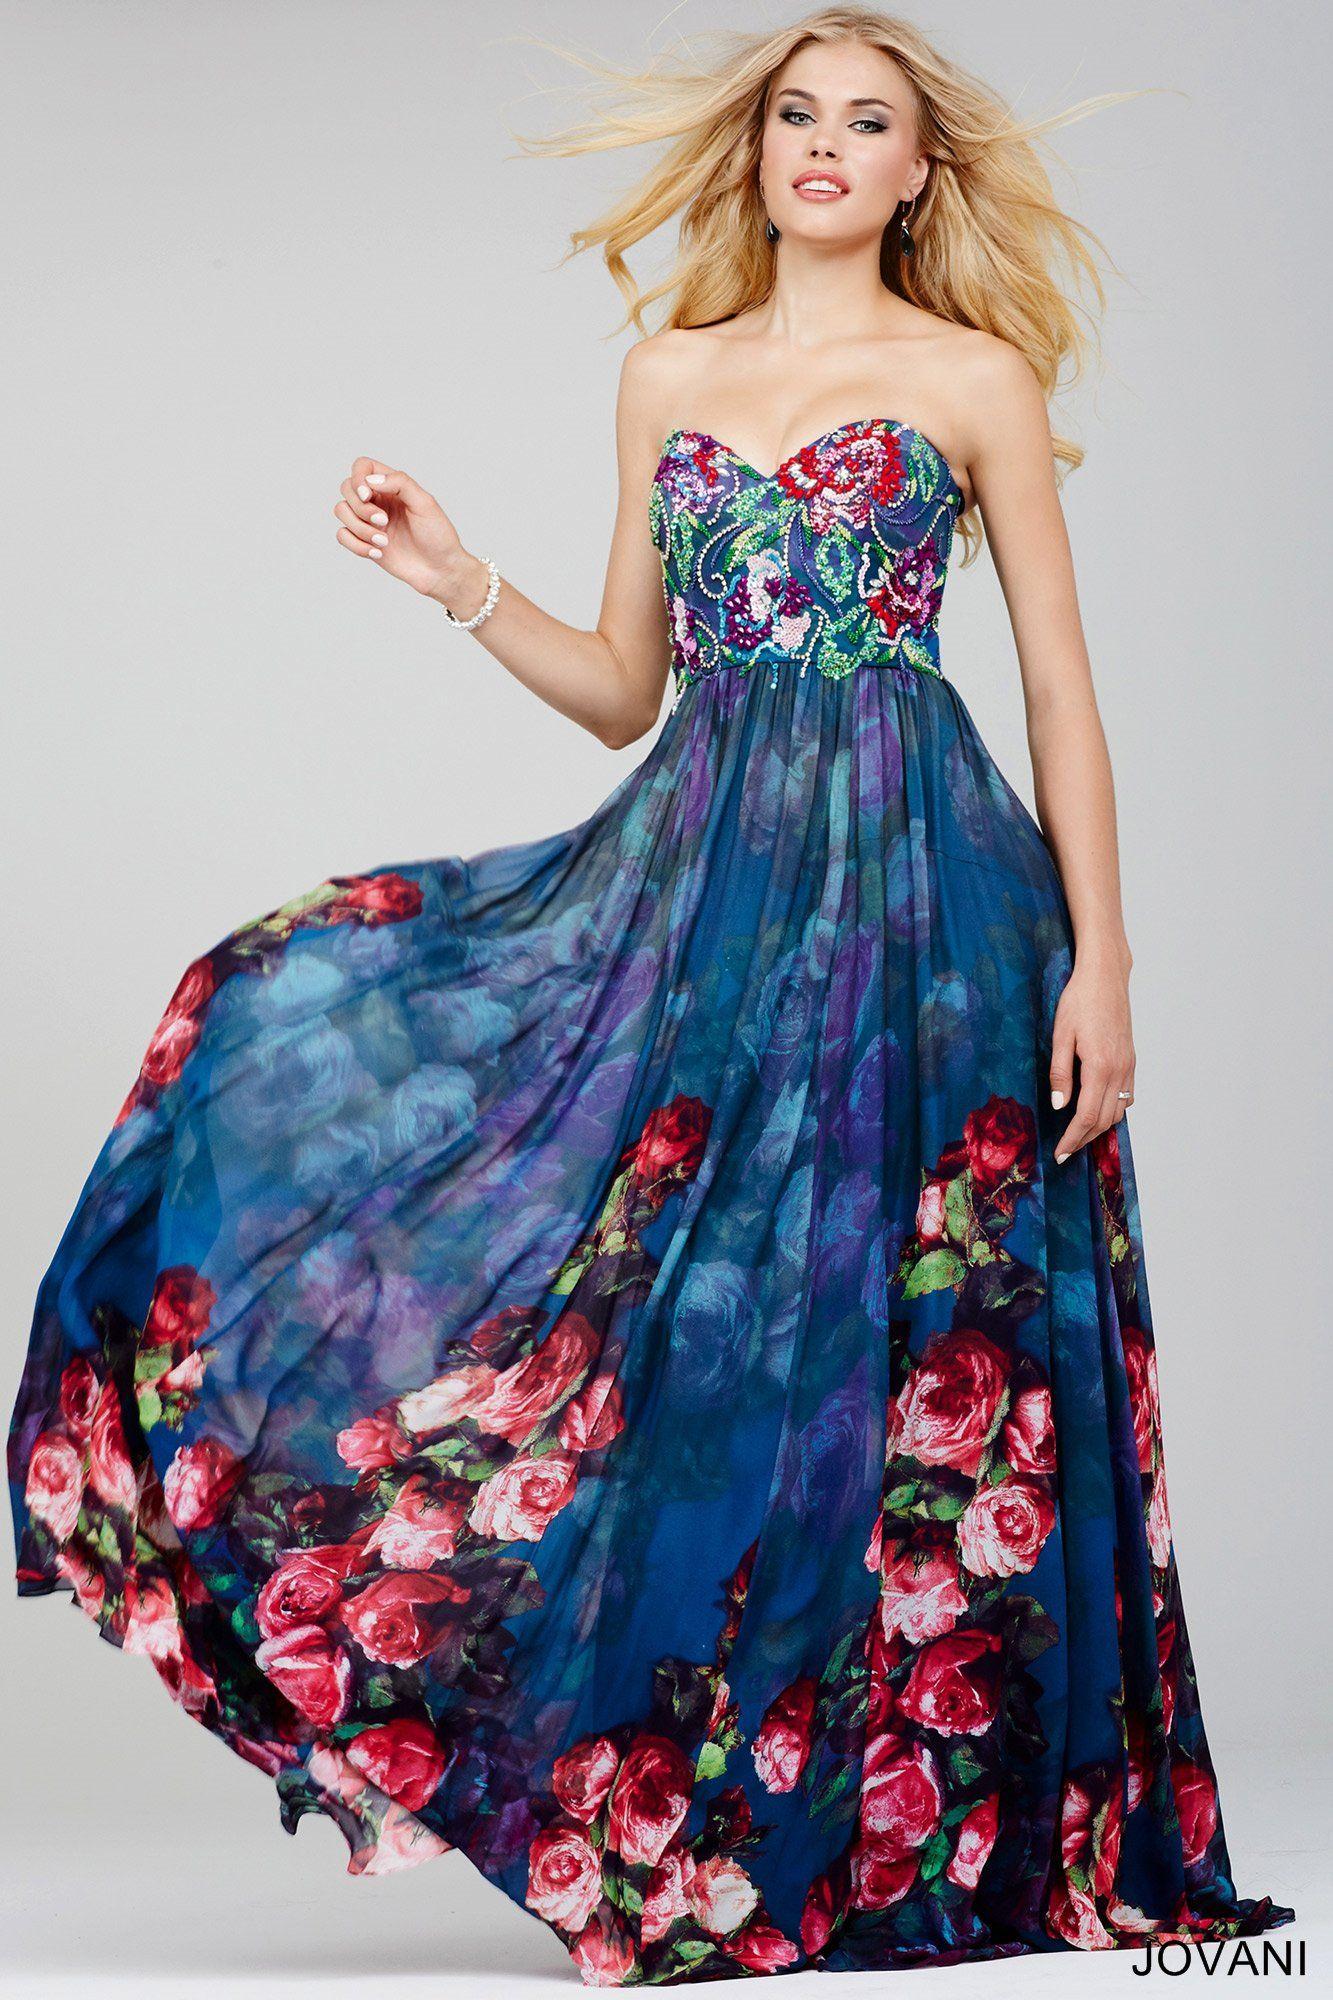 Garden Party Chic Jovani 24022 Jovani Prom 2016 Prom Dresses